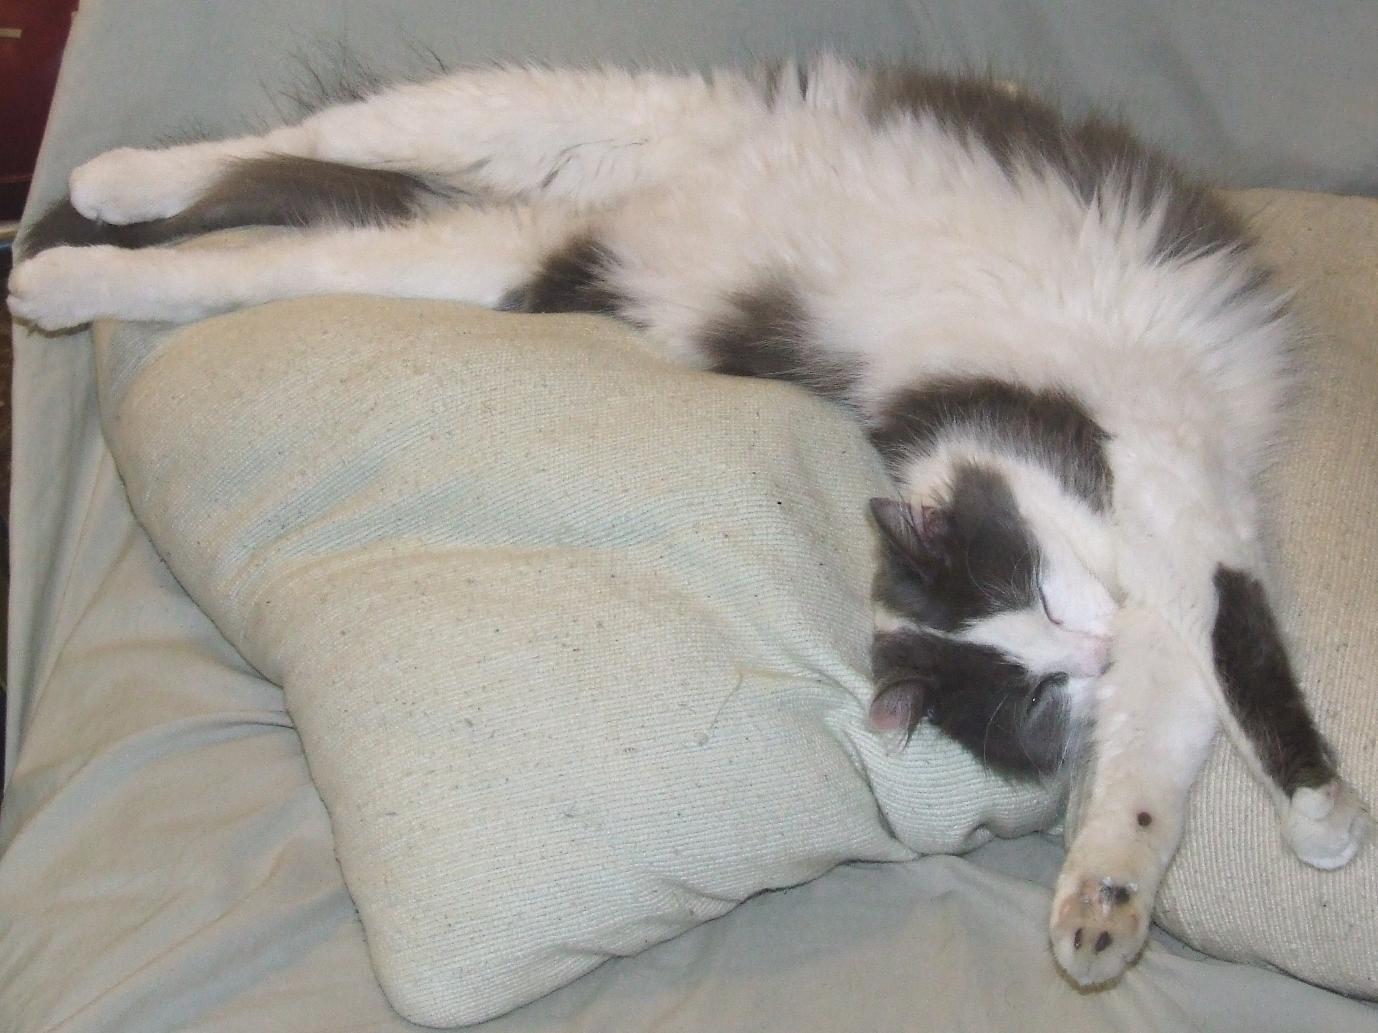 Felis_silvestris_catus_%28cat_stretching